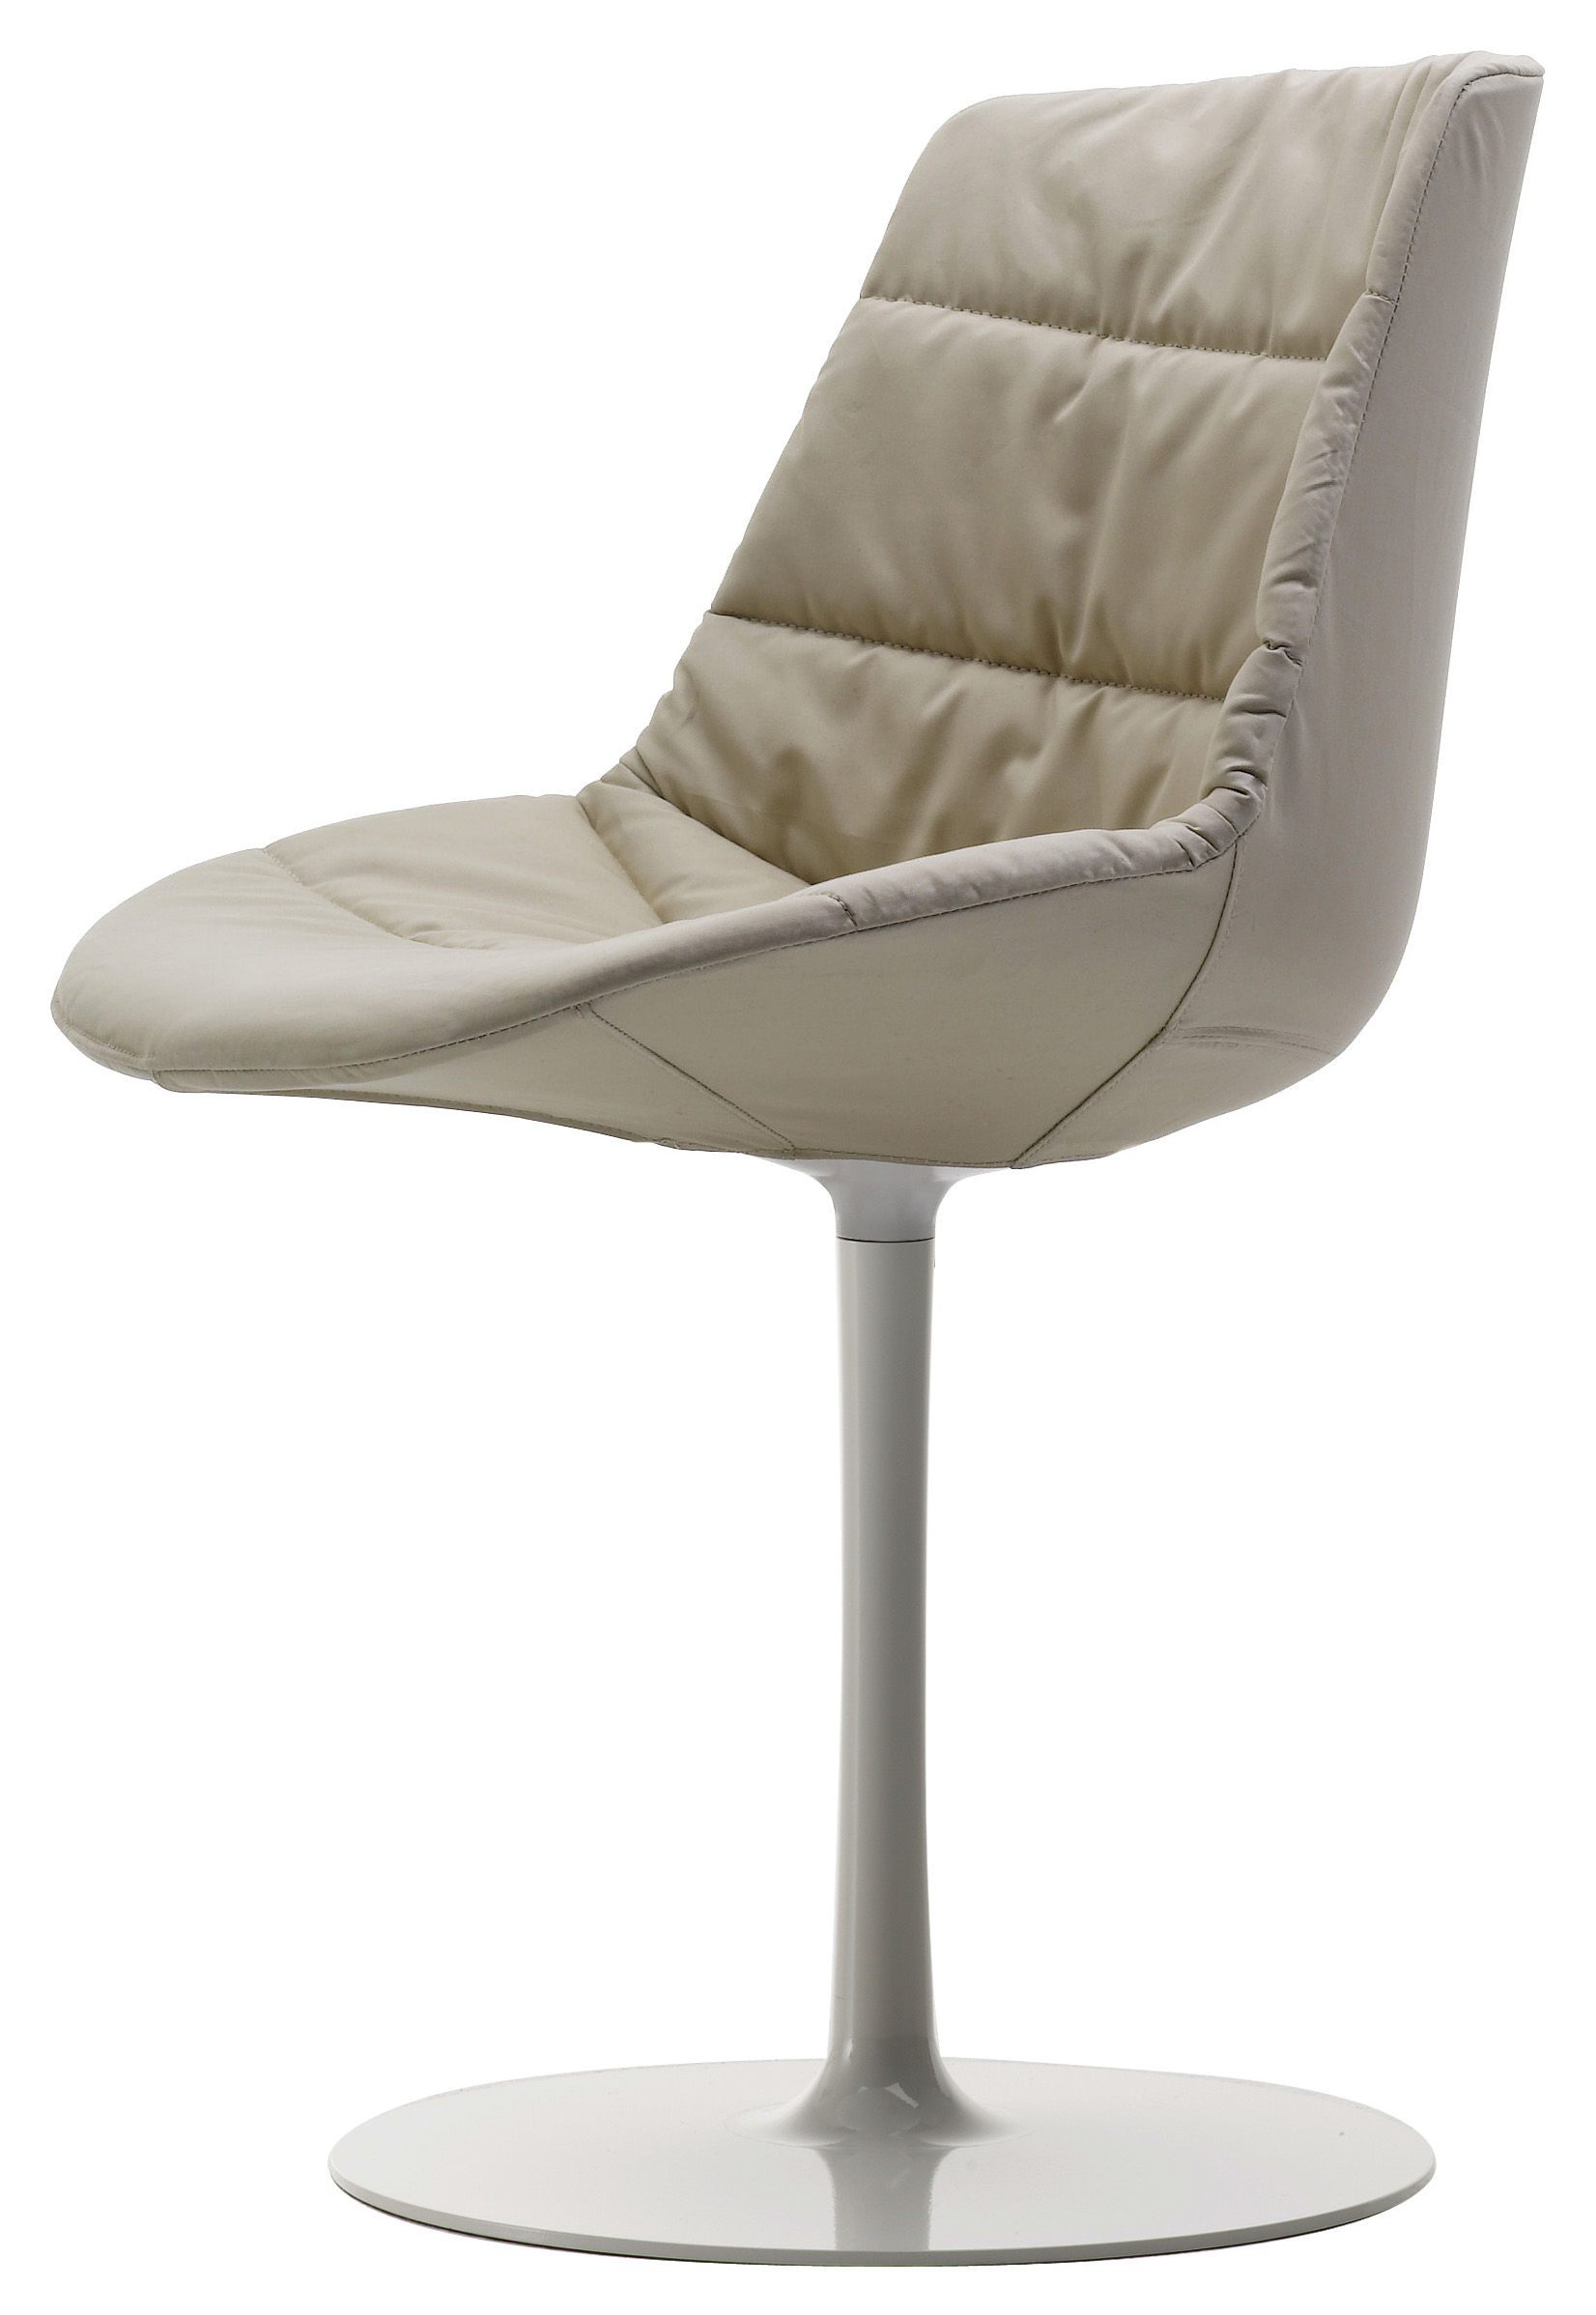 chaise rembourr e flow textile pied central tissu beige londra pi tement blanc mdf italia. Black Bedroom Furniture Sets. Home Design Ideas